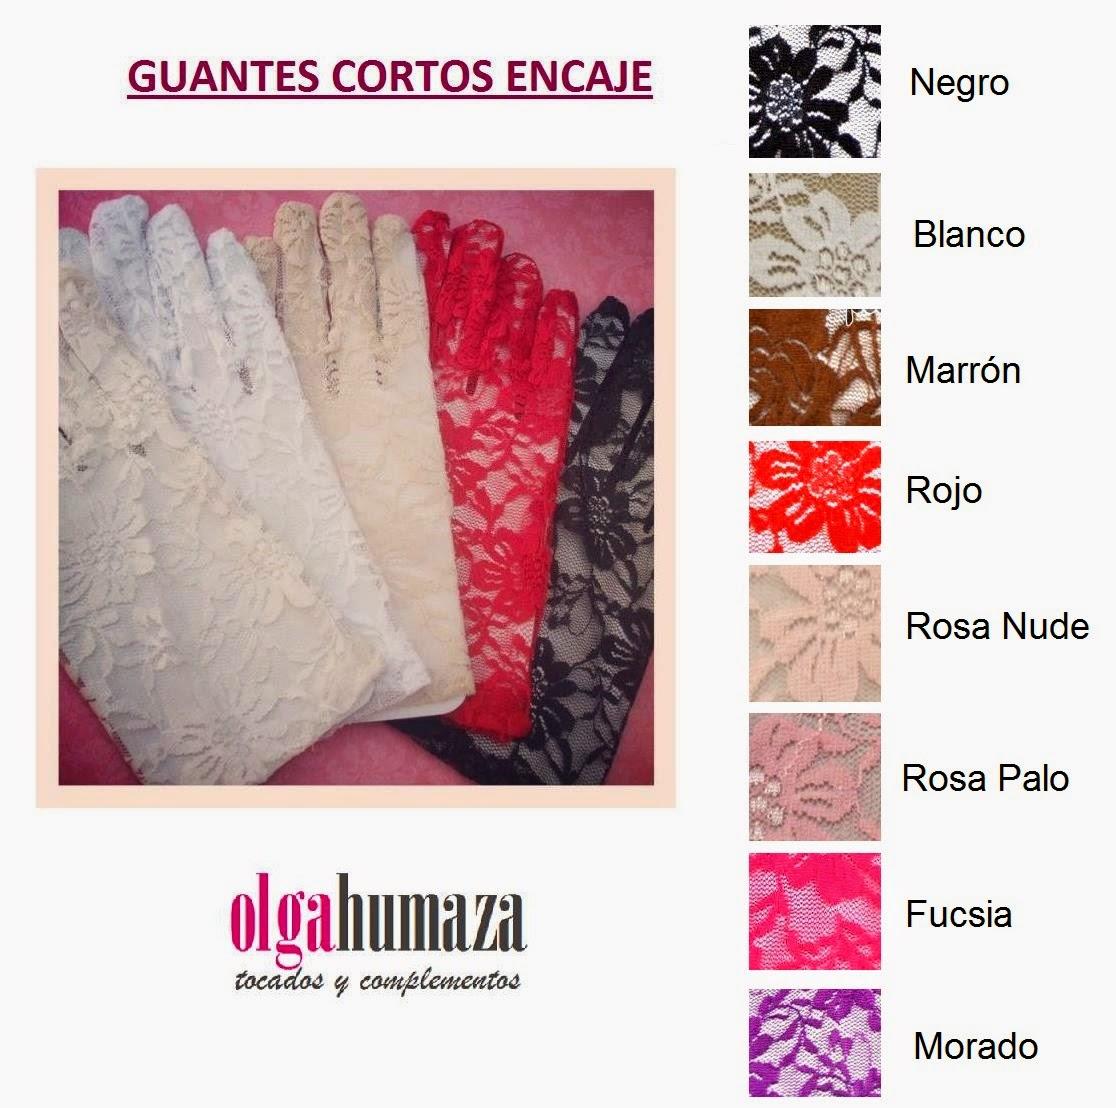 http://olgahumaza.blogspot.com.es/2014/02/g01-guantes-cortos-de-encaje-varios.html